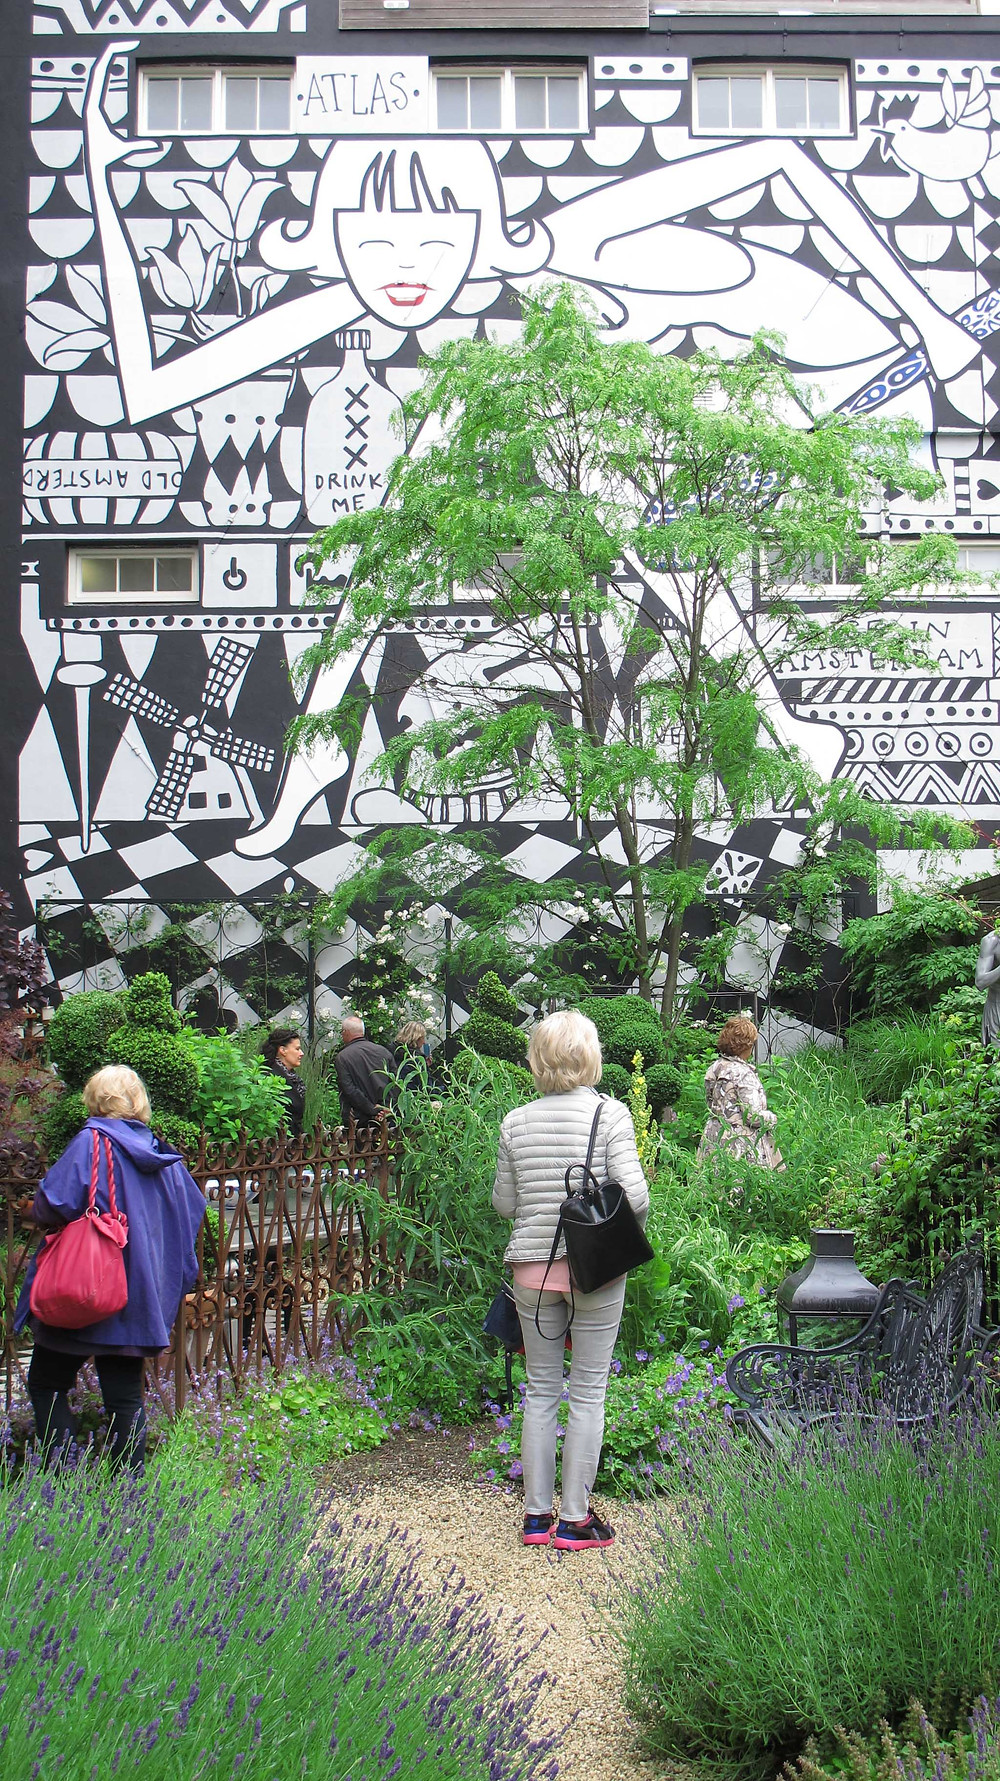 mural, graffiti, alice in wonderland garden,